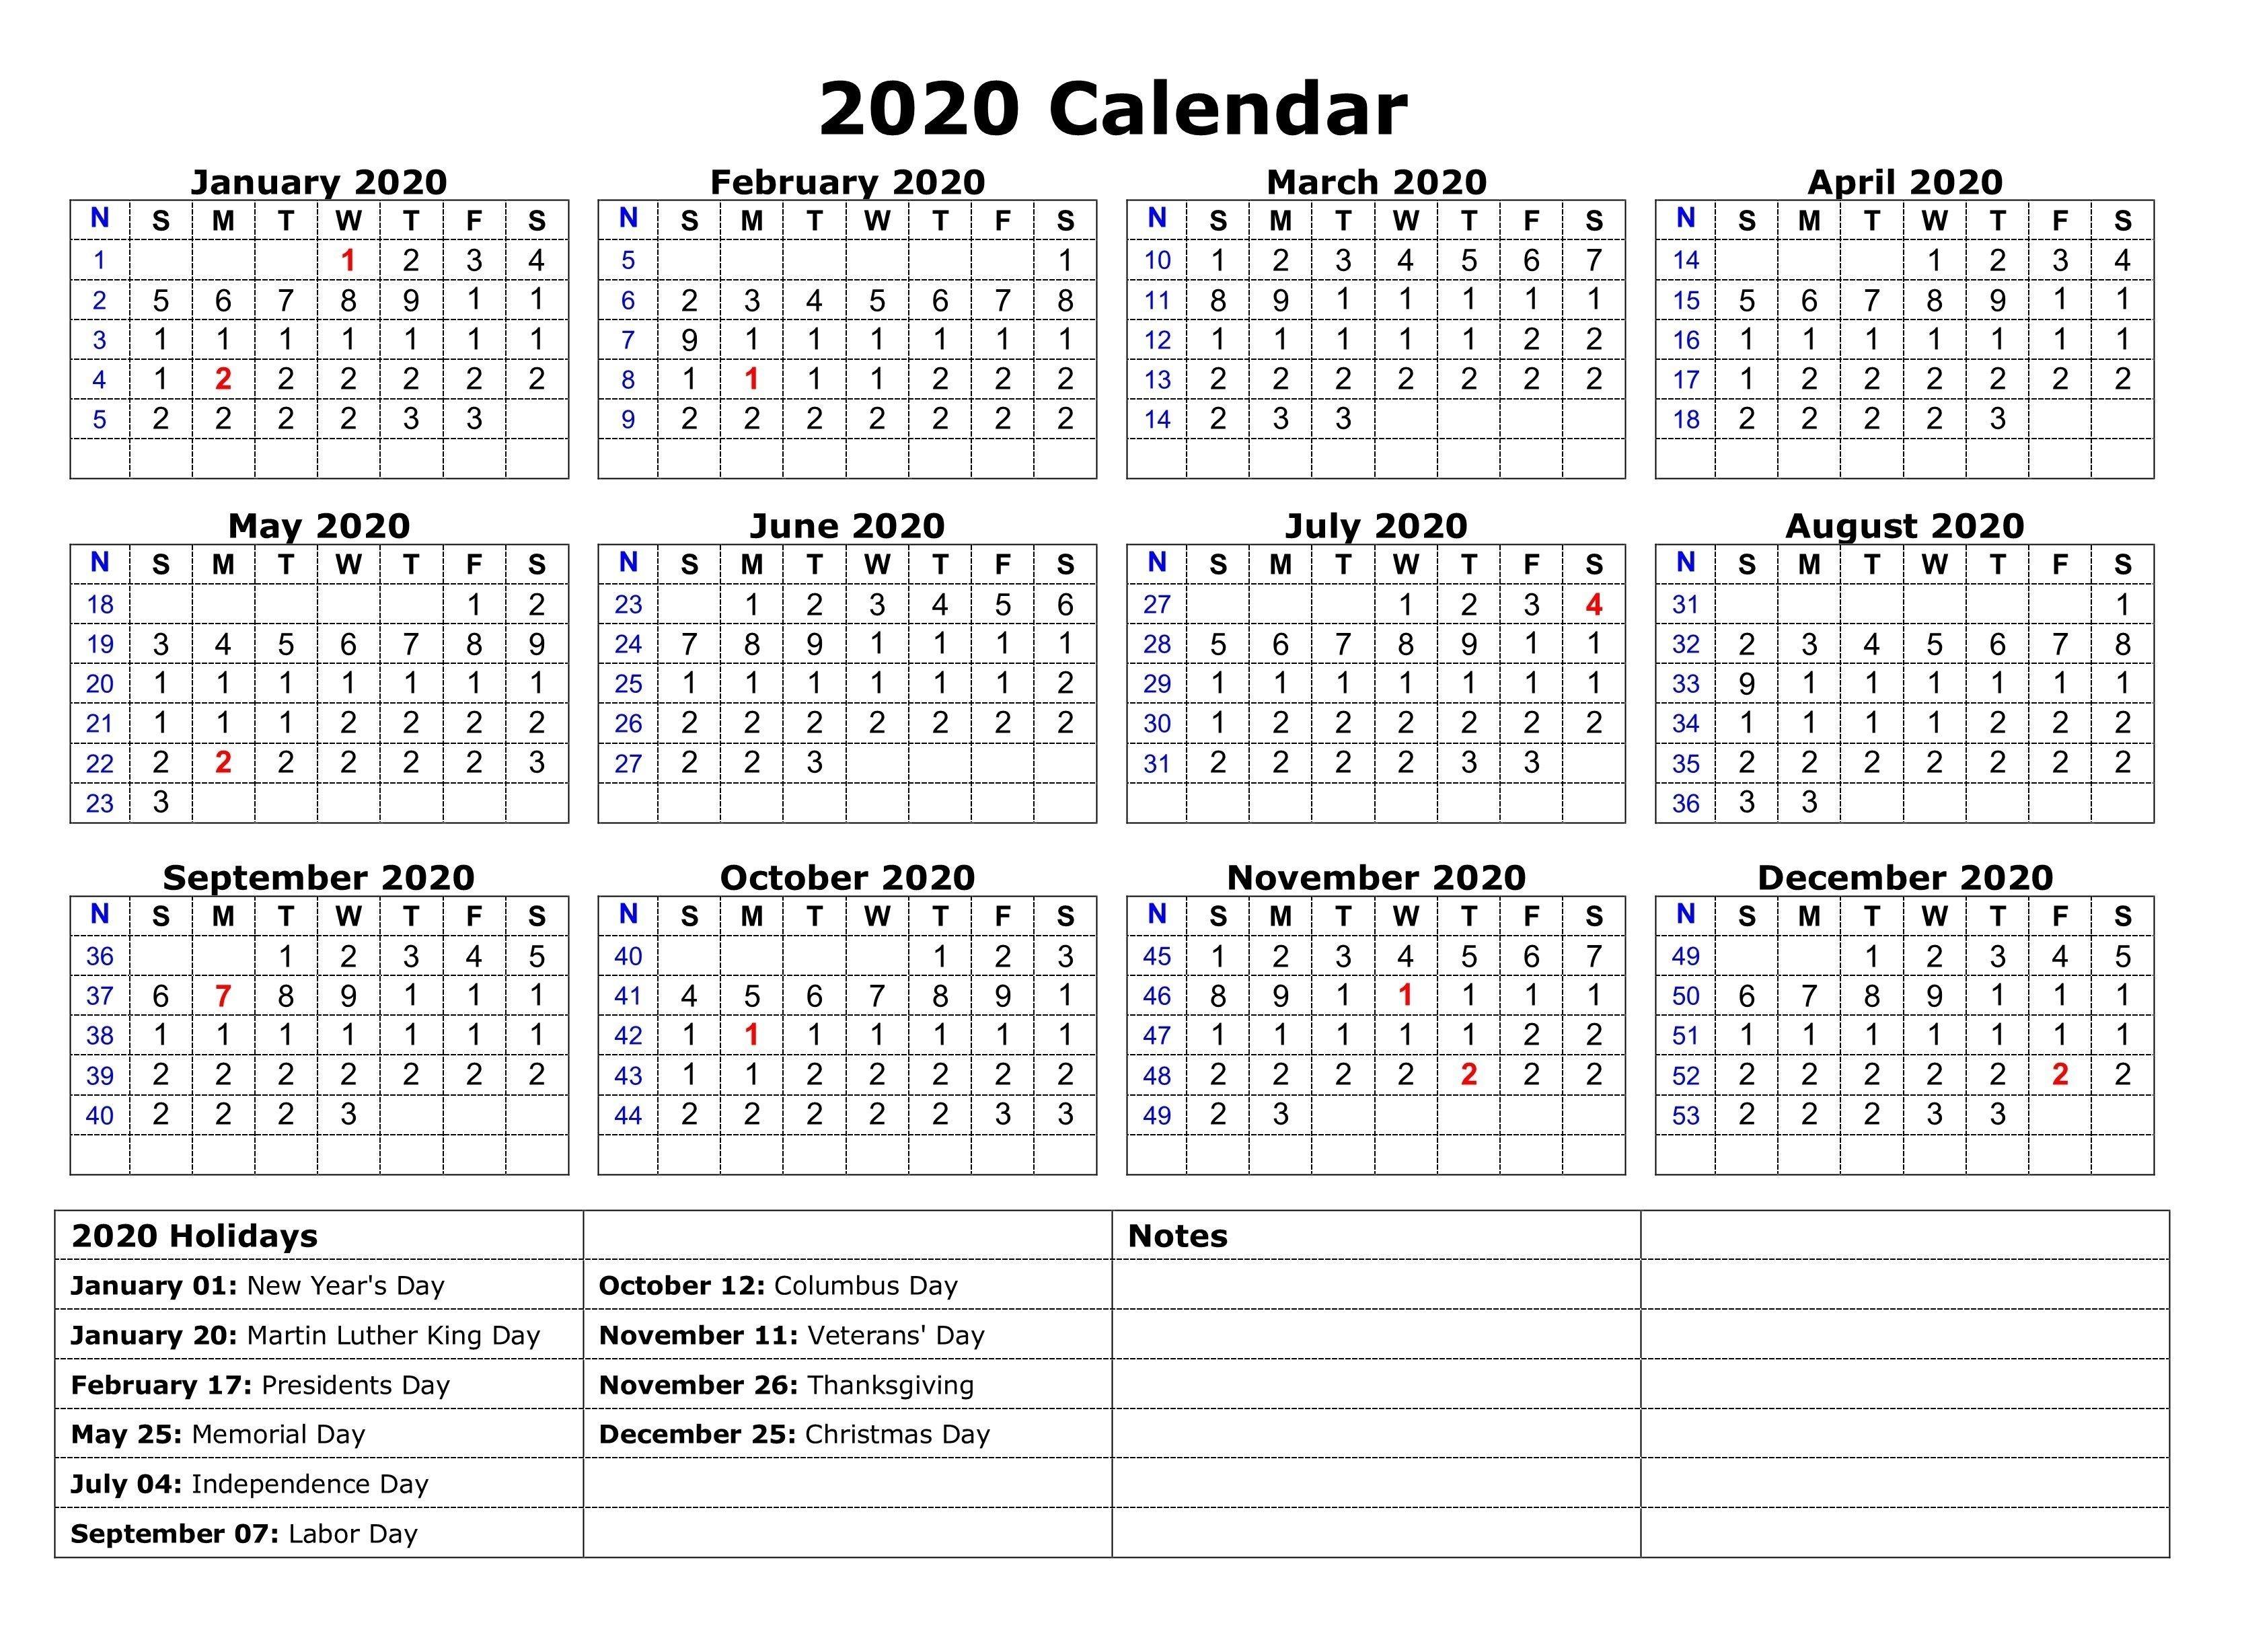 Printable 2020 One Page Holidays Calendar | 2020 Calendars-Calendar 2020 Printable Holidays Special